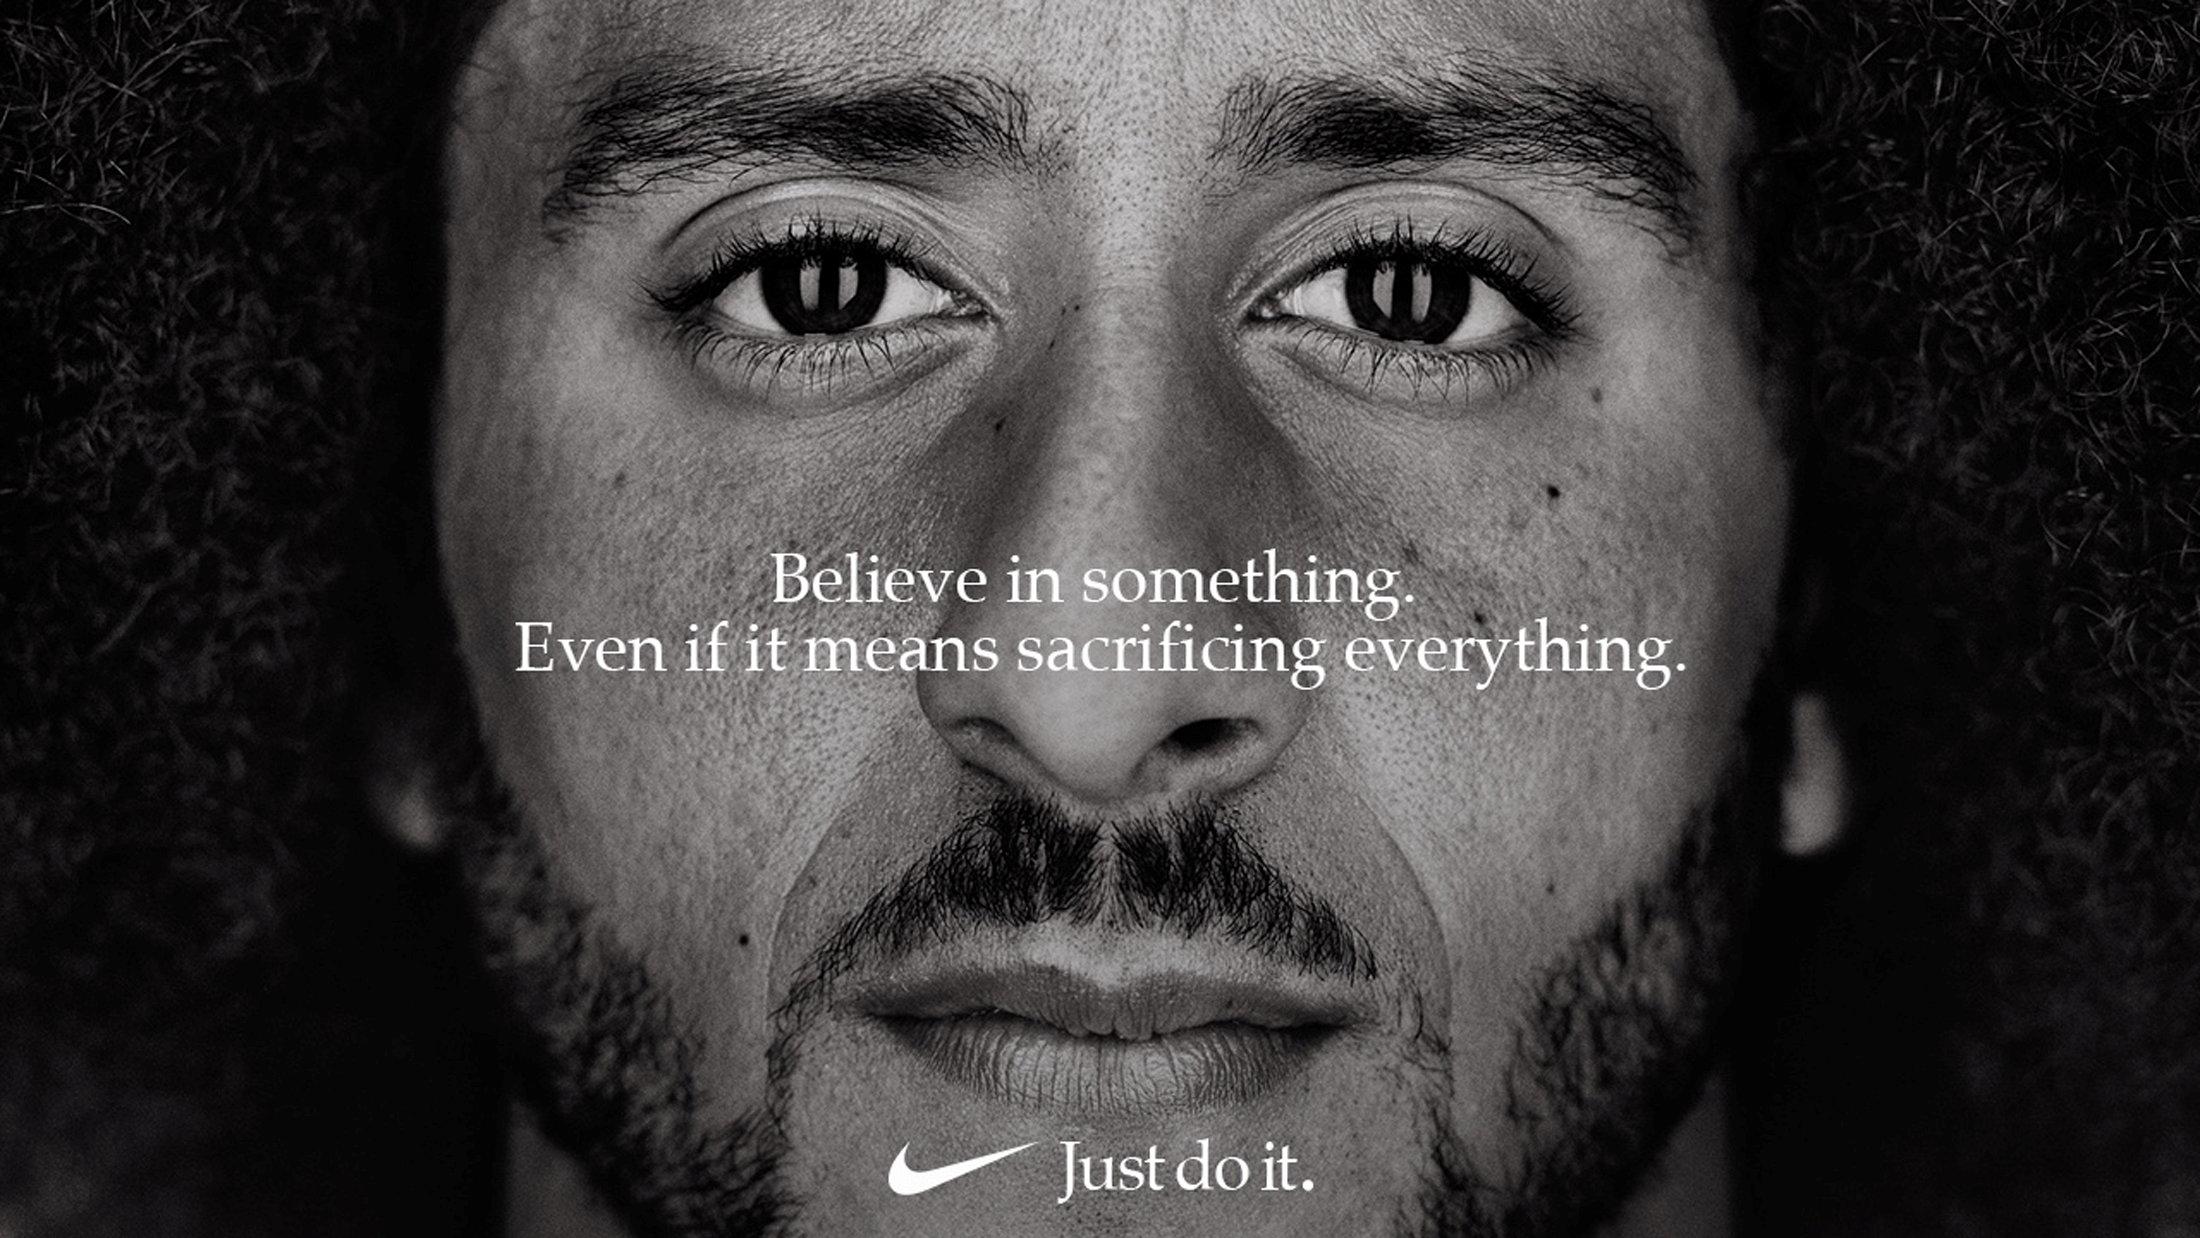 La imagen de Kaepernick arrastra a Nike en la bolsa